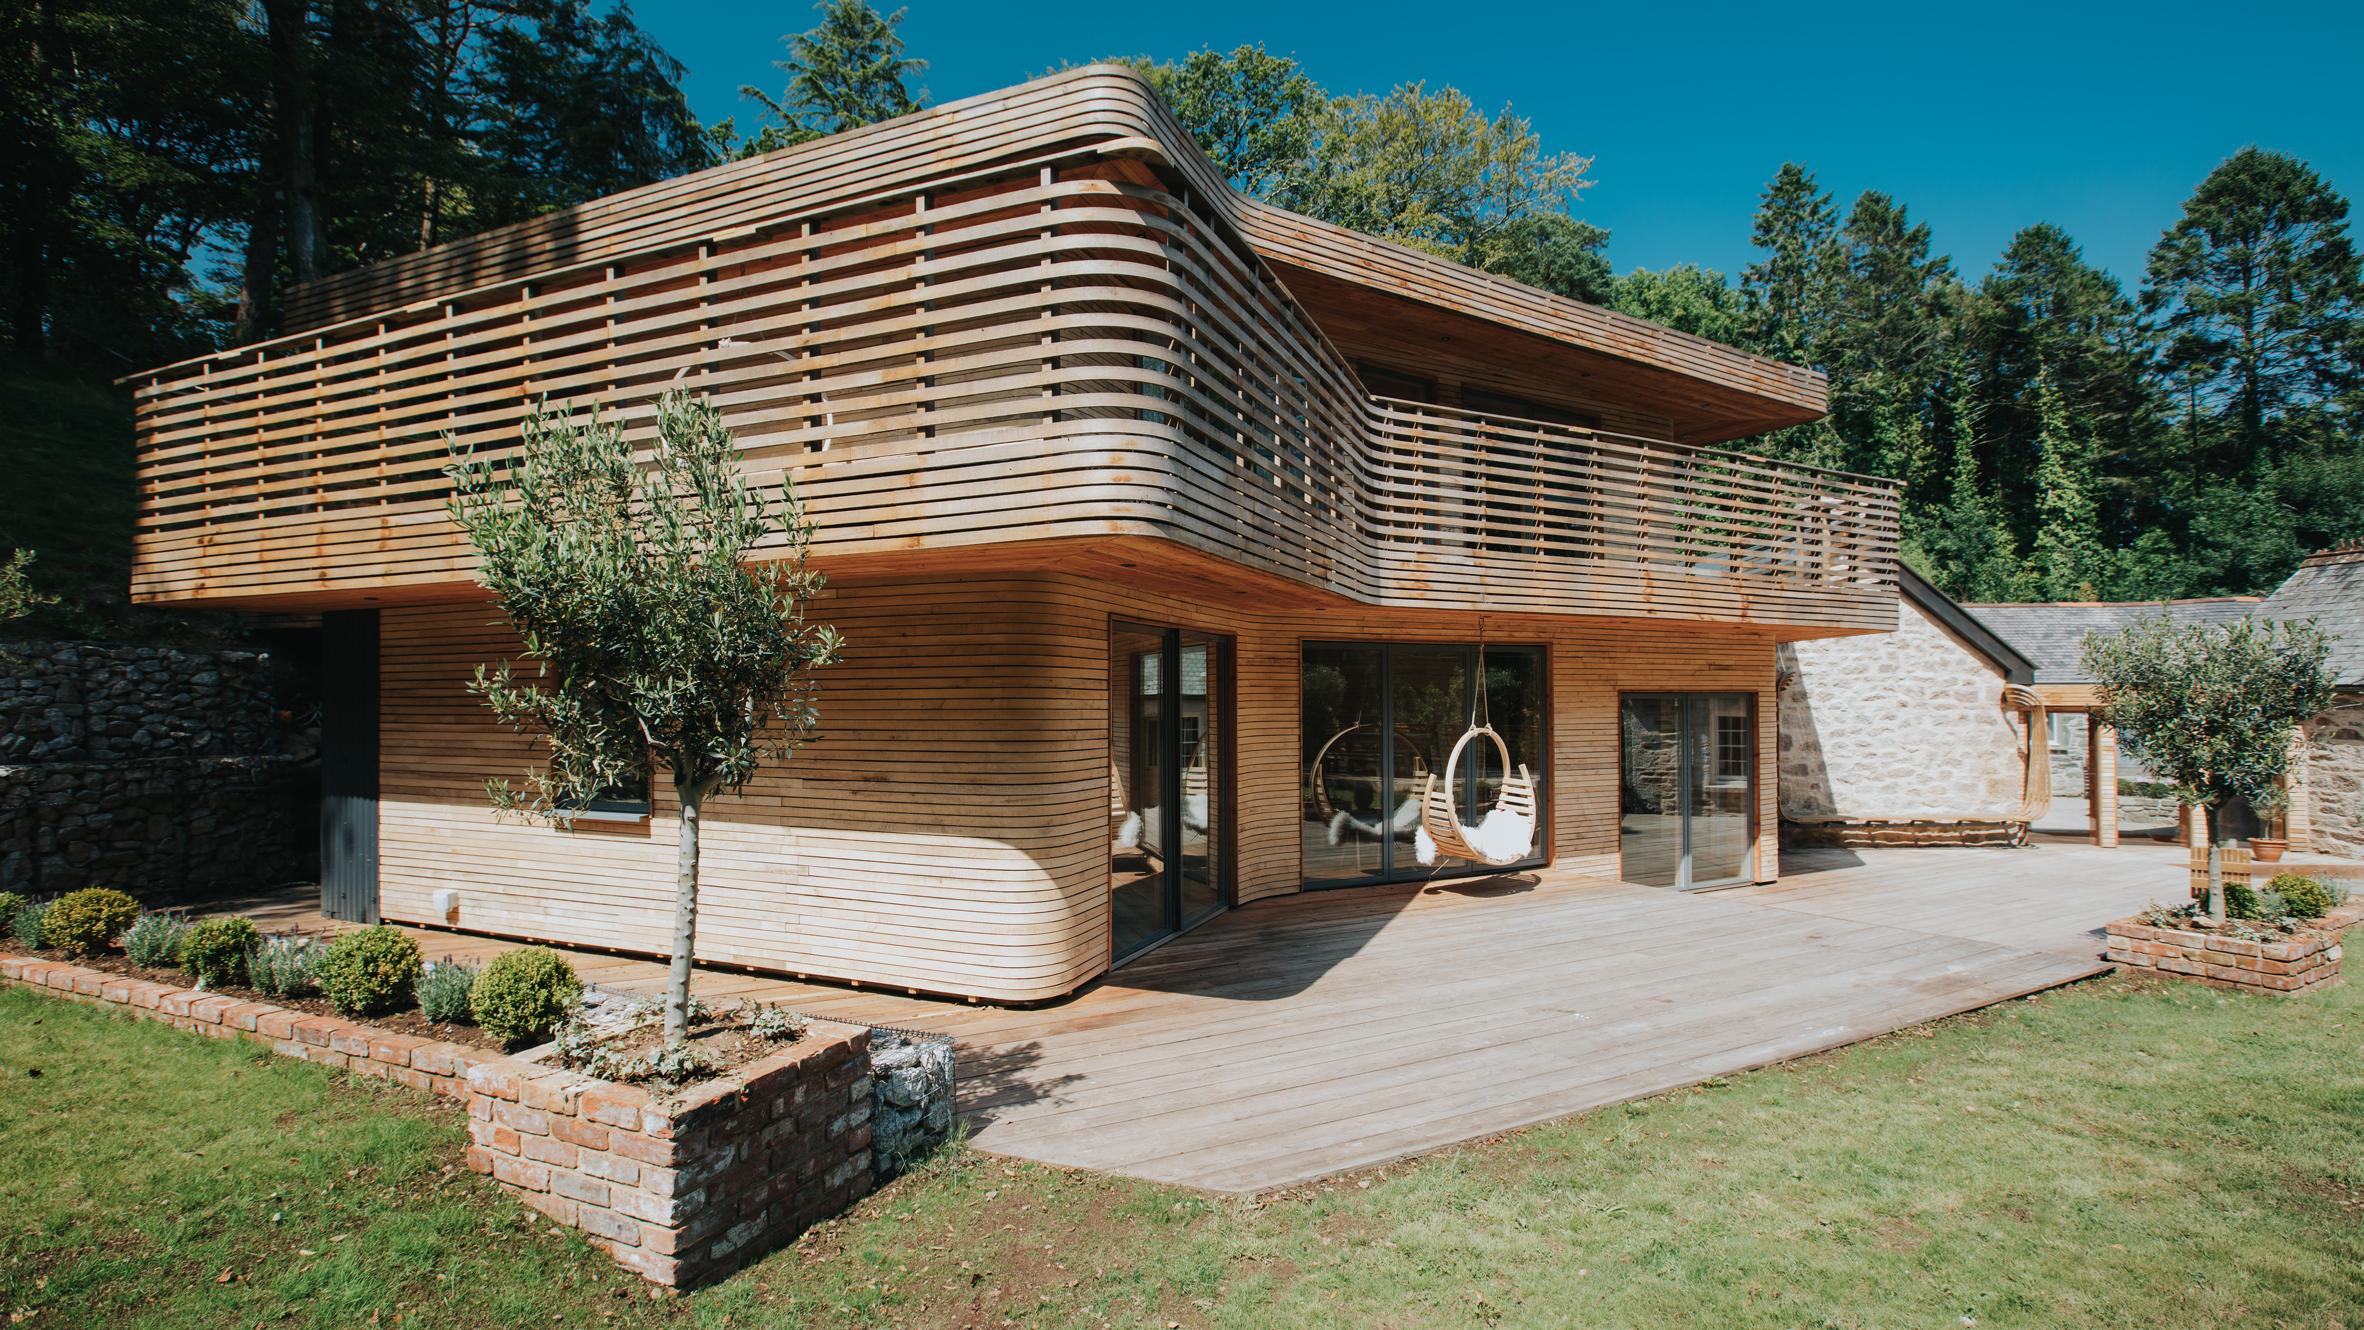 tom-raffield-grand-designs-house-dezeen-hero1.jpg